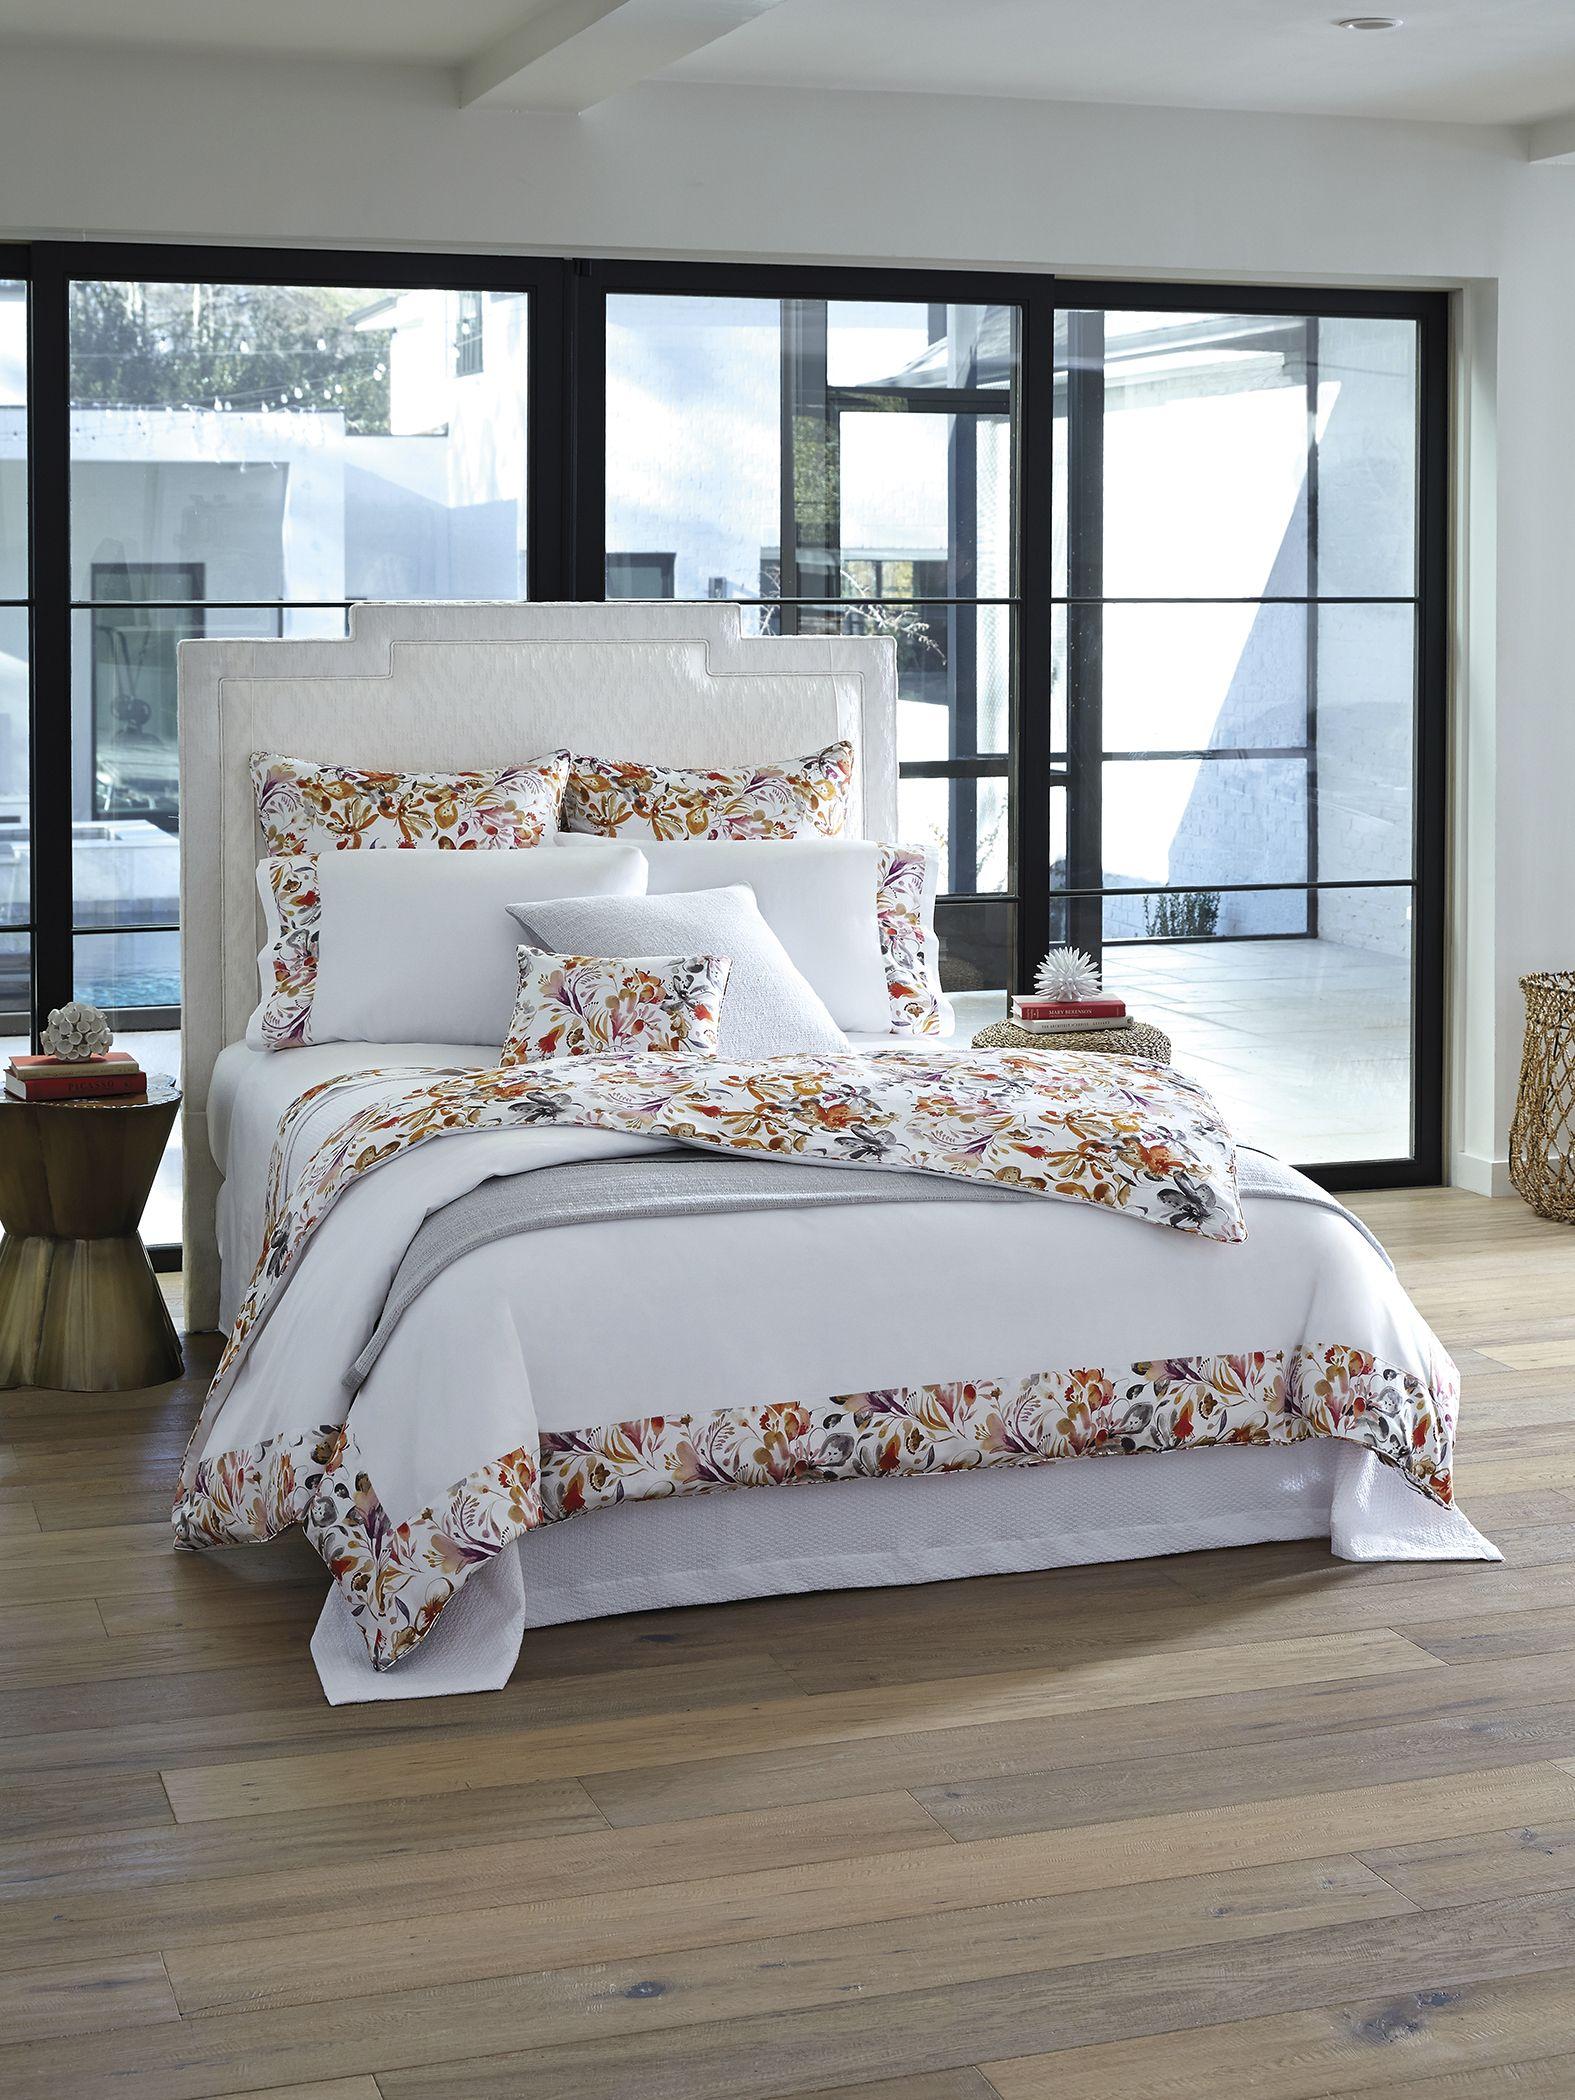 Este's sateen appliqué dresses a bed top with abundant, lush leaves, petals and tendrils of warm color.